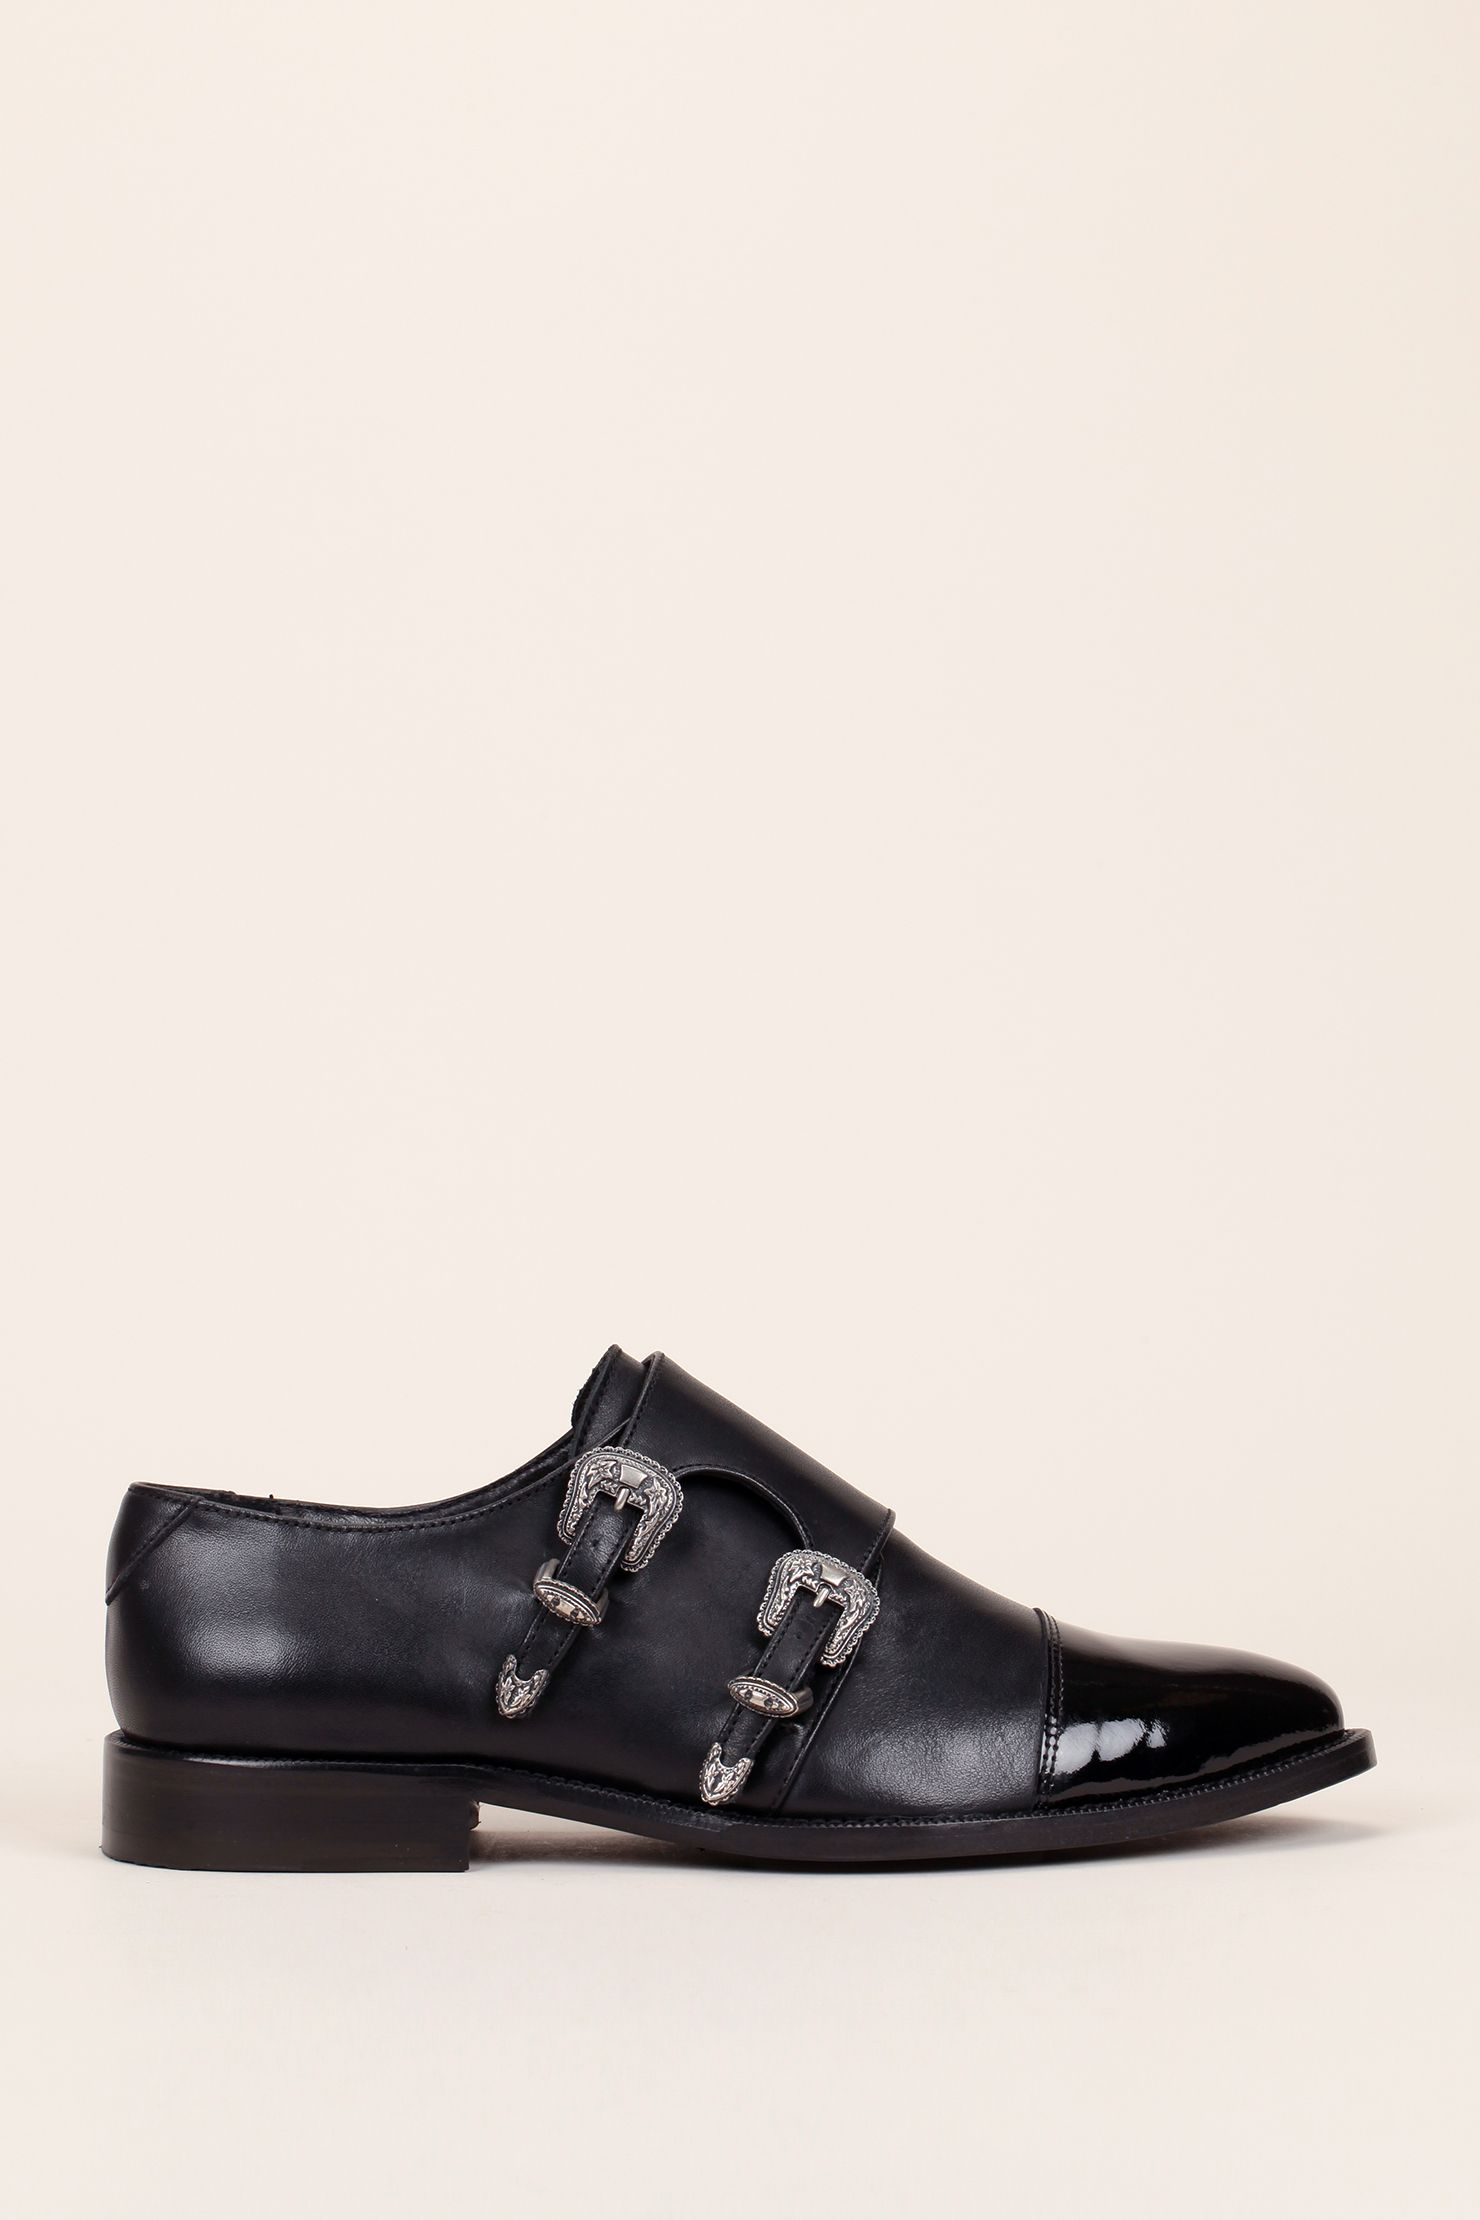 Chaussures Womens En Vente Dans La Sortie, Cuir Brun, Cuir, 2017, 36 37,5 38 Valentino